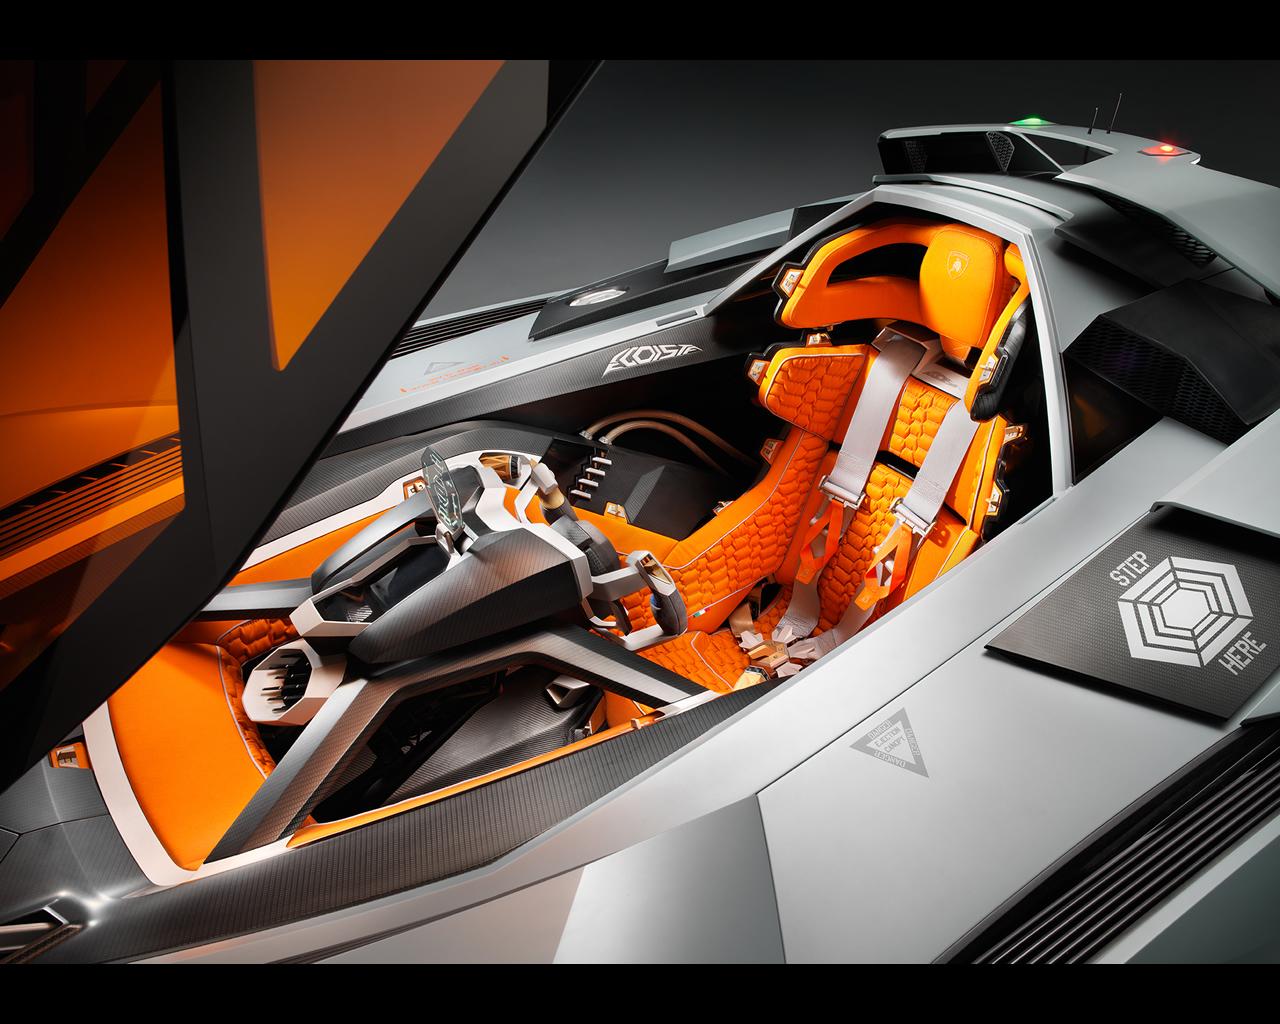 Lamborghini Concept 2013 Egoista Lamborghini Egoista Fi...